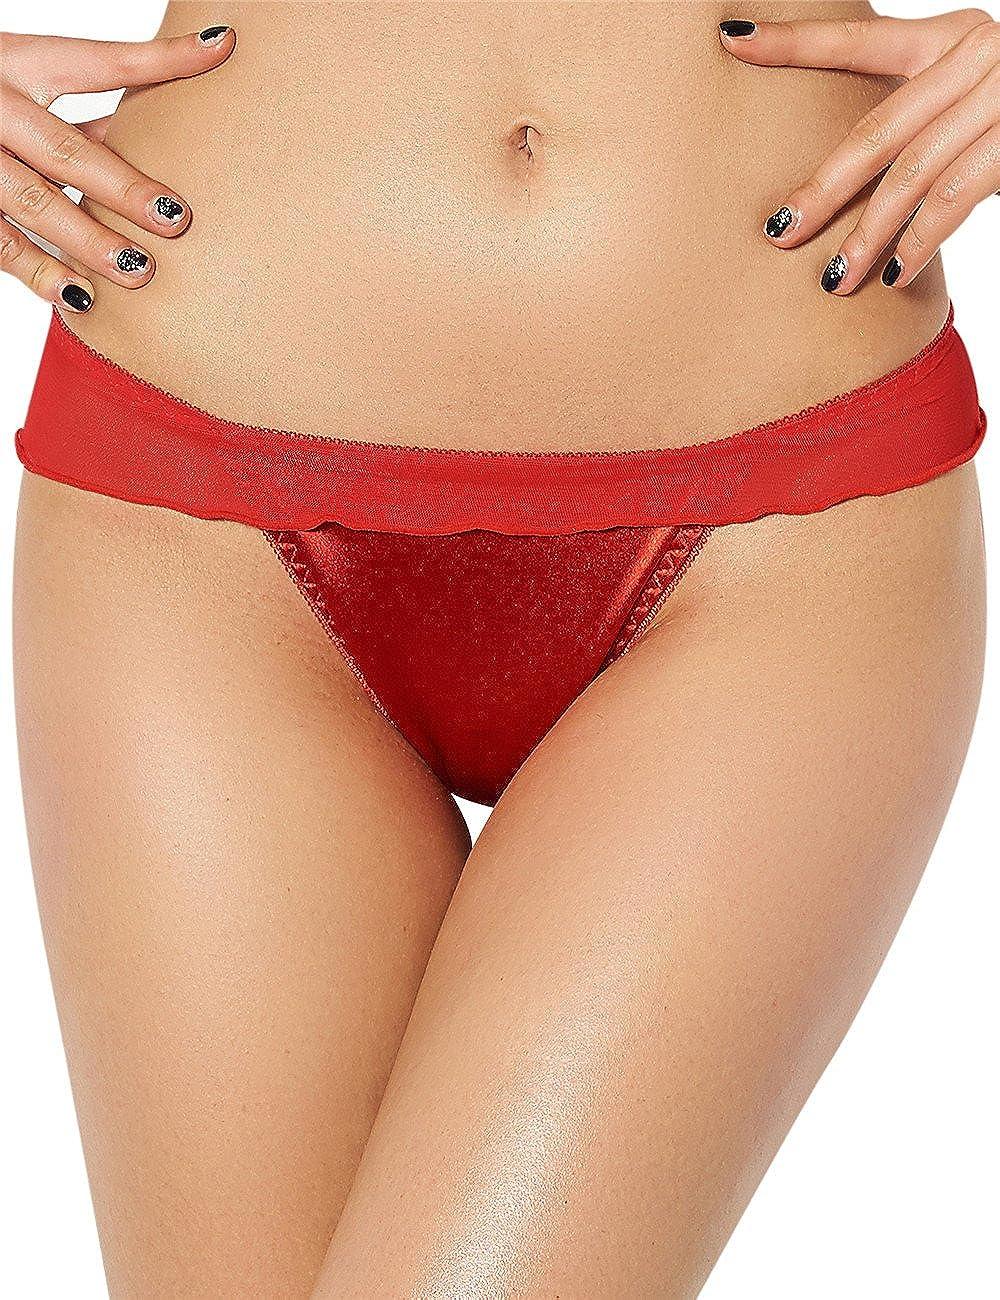 Oliveya Womens Satin Bow Lingerie G-String Thongs Sheer Ruffle Panties Underwear